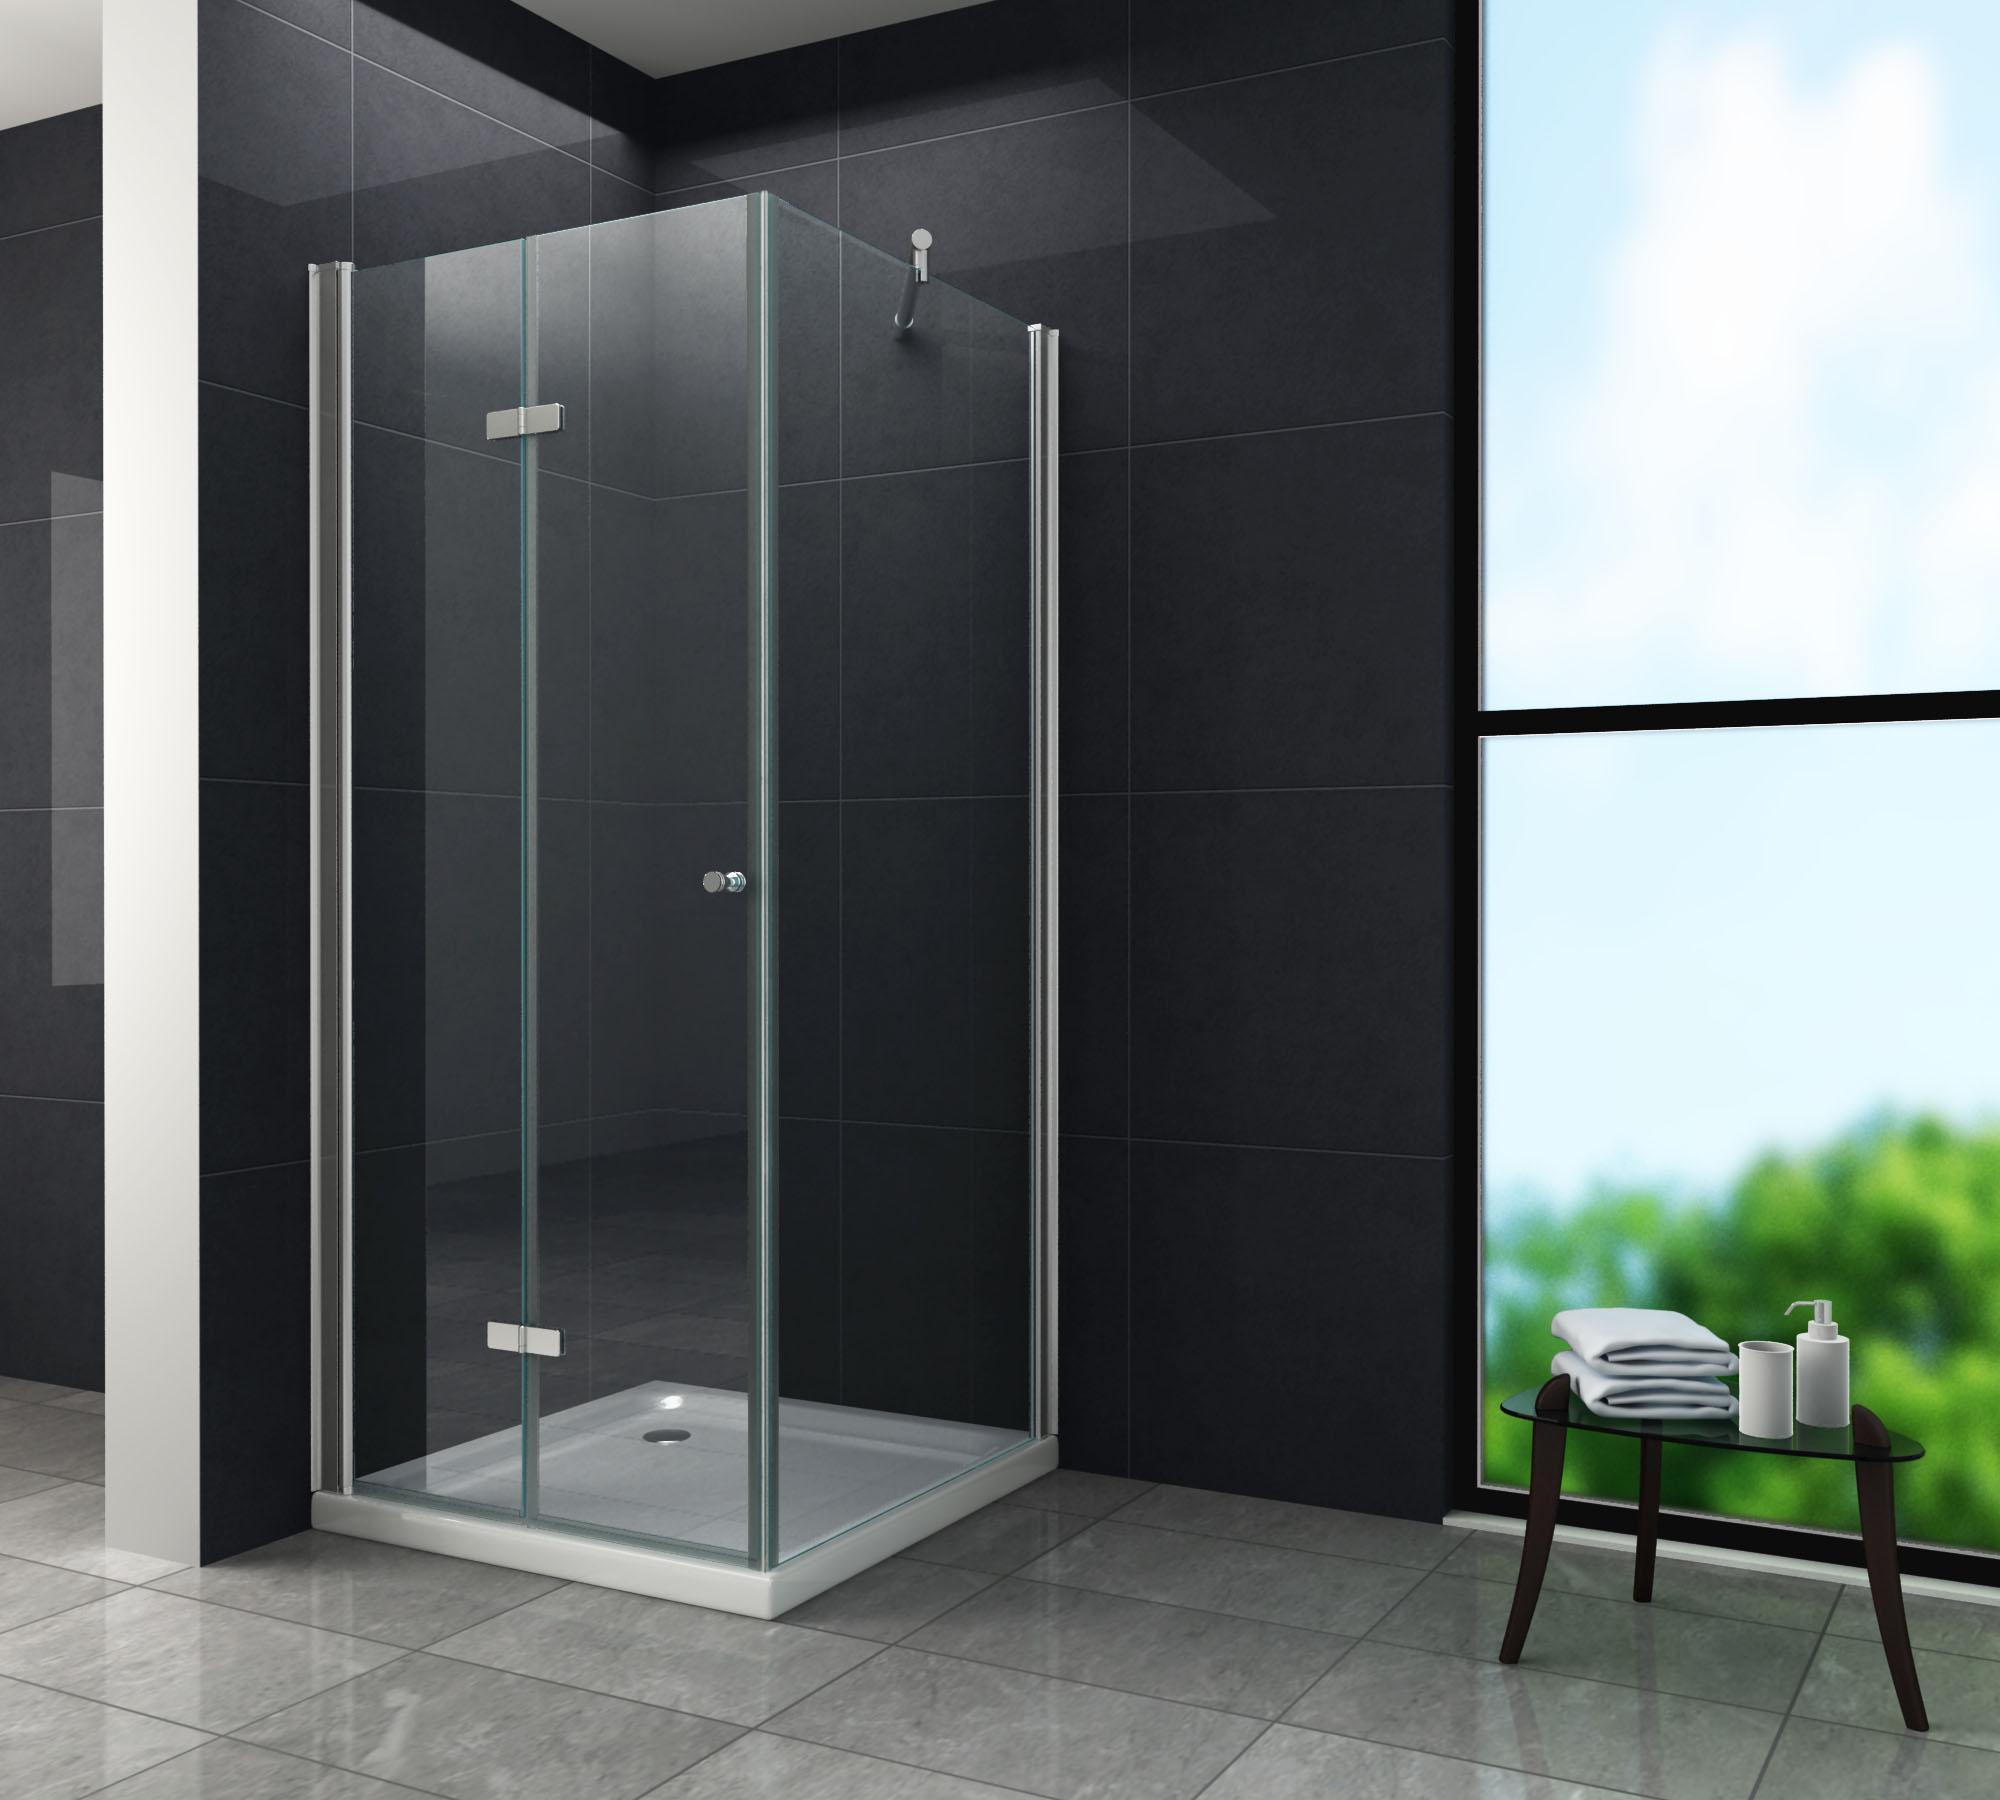 faltt r duschkabine onto 100 x 100 x 195 cm ohne. Black Bedroom Furniture Sets. Home Design Ideas